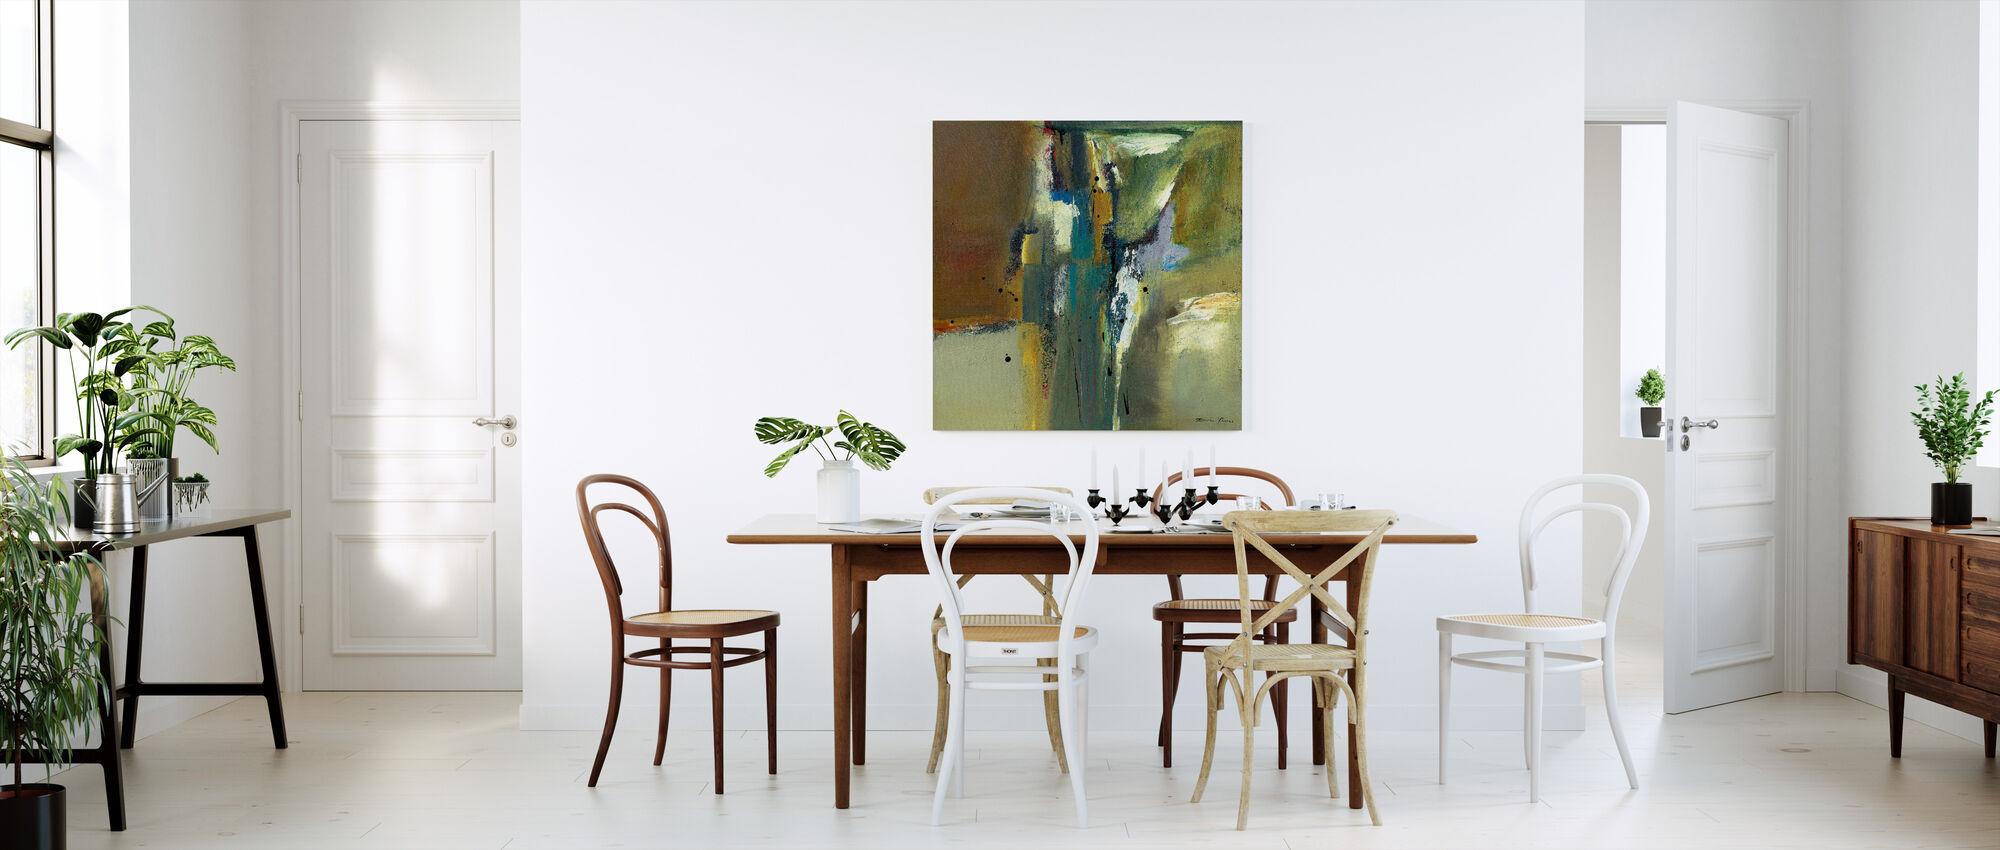 Abstrakt i grönt - Canvastavla - Kök